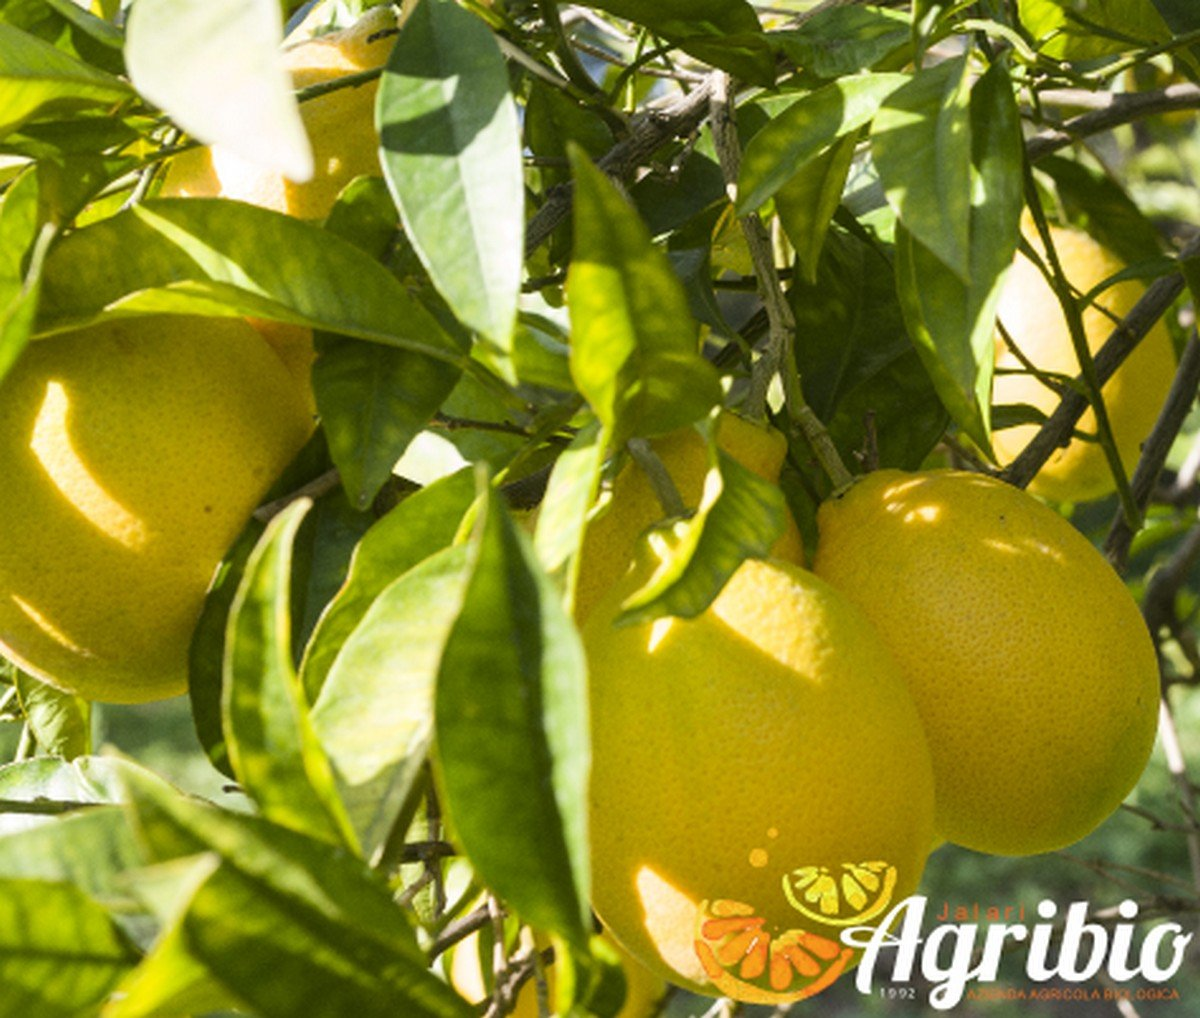 Azienda agricola biologica jalari Agrumi biologici siciliani - arancio tarocco messina